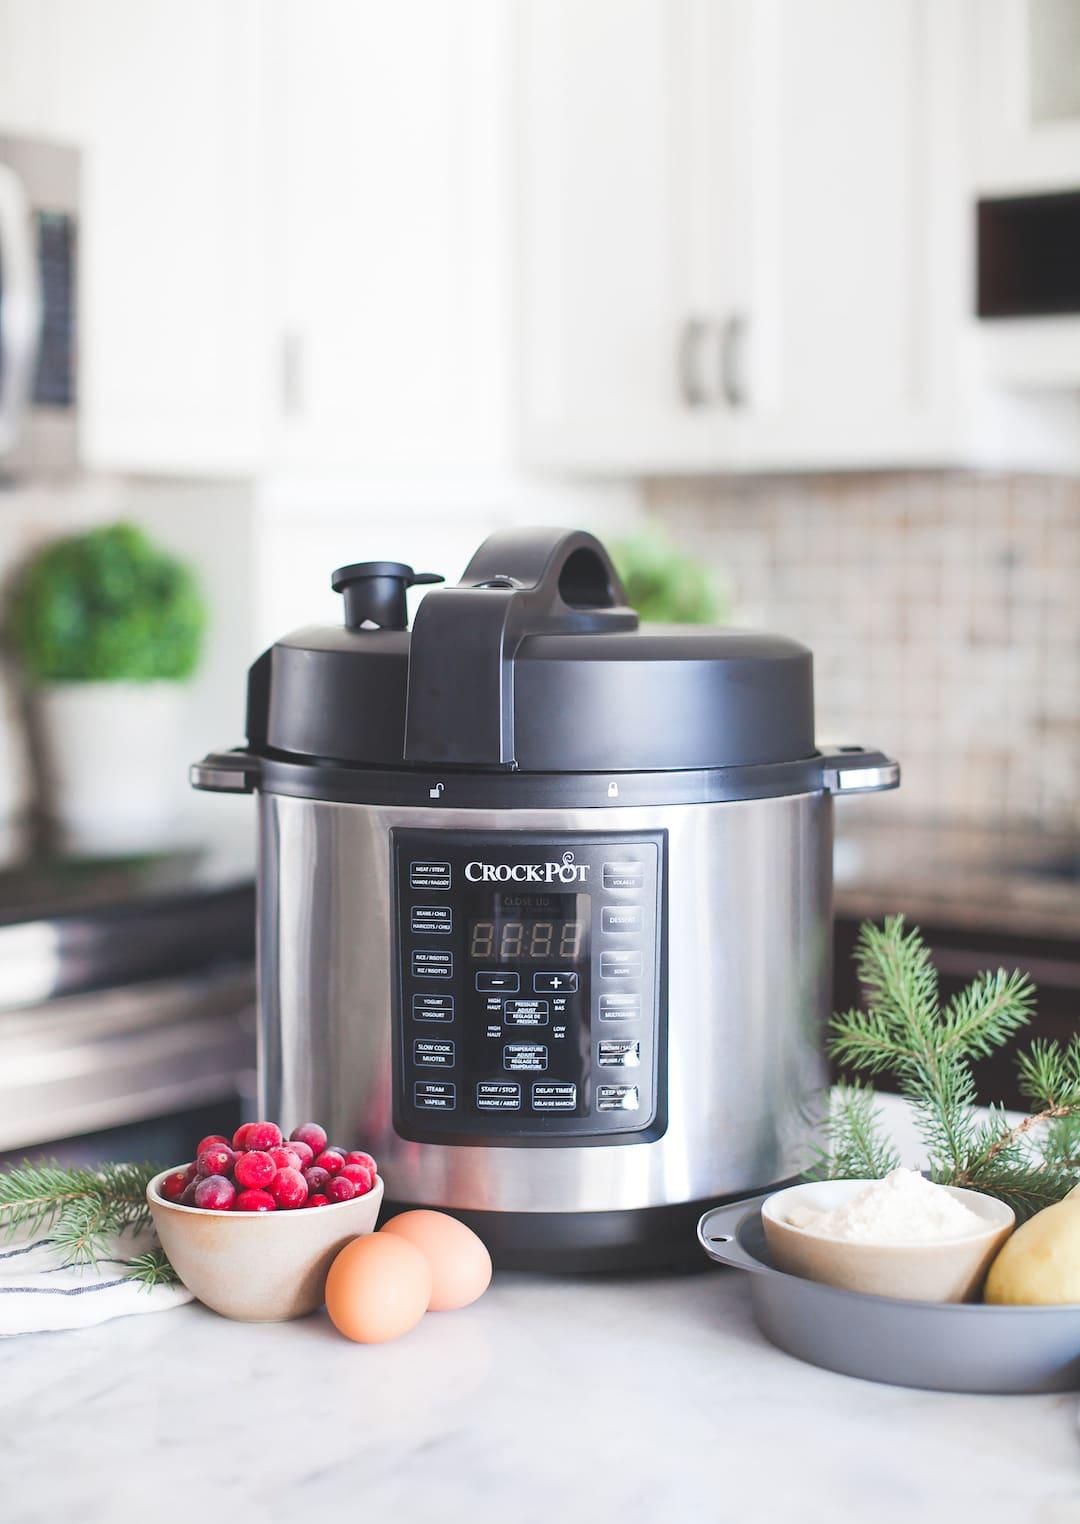 Crock Pot Express Crock Pressure Cooker